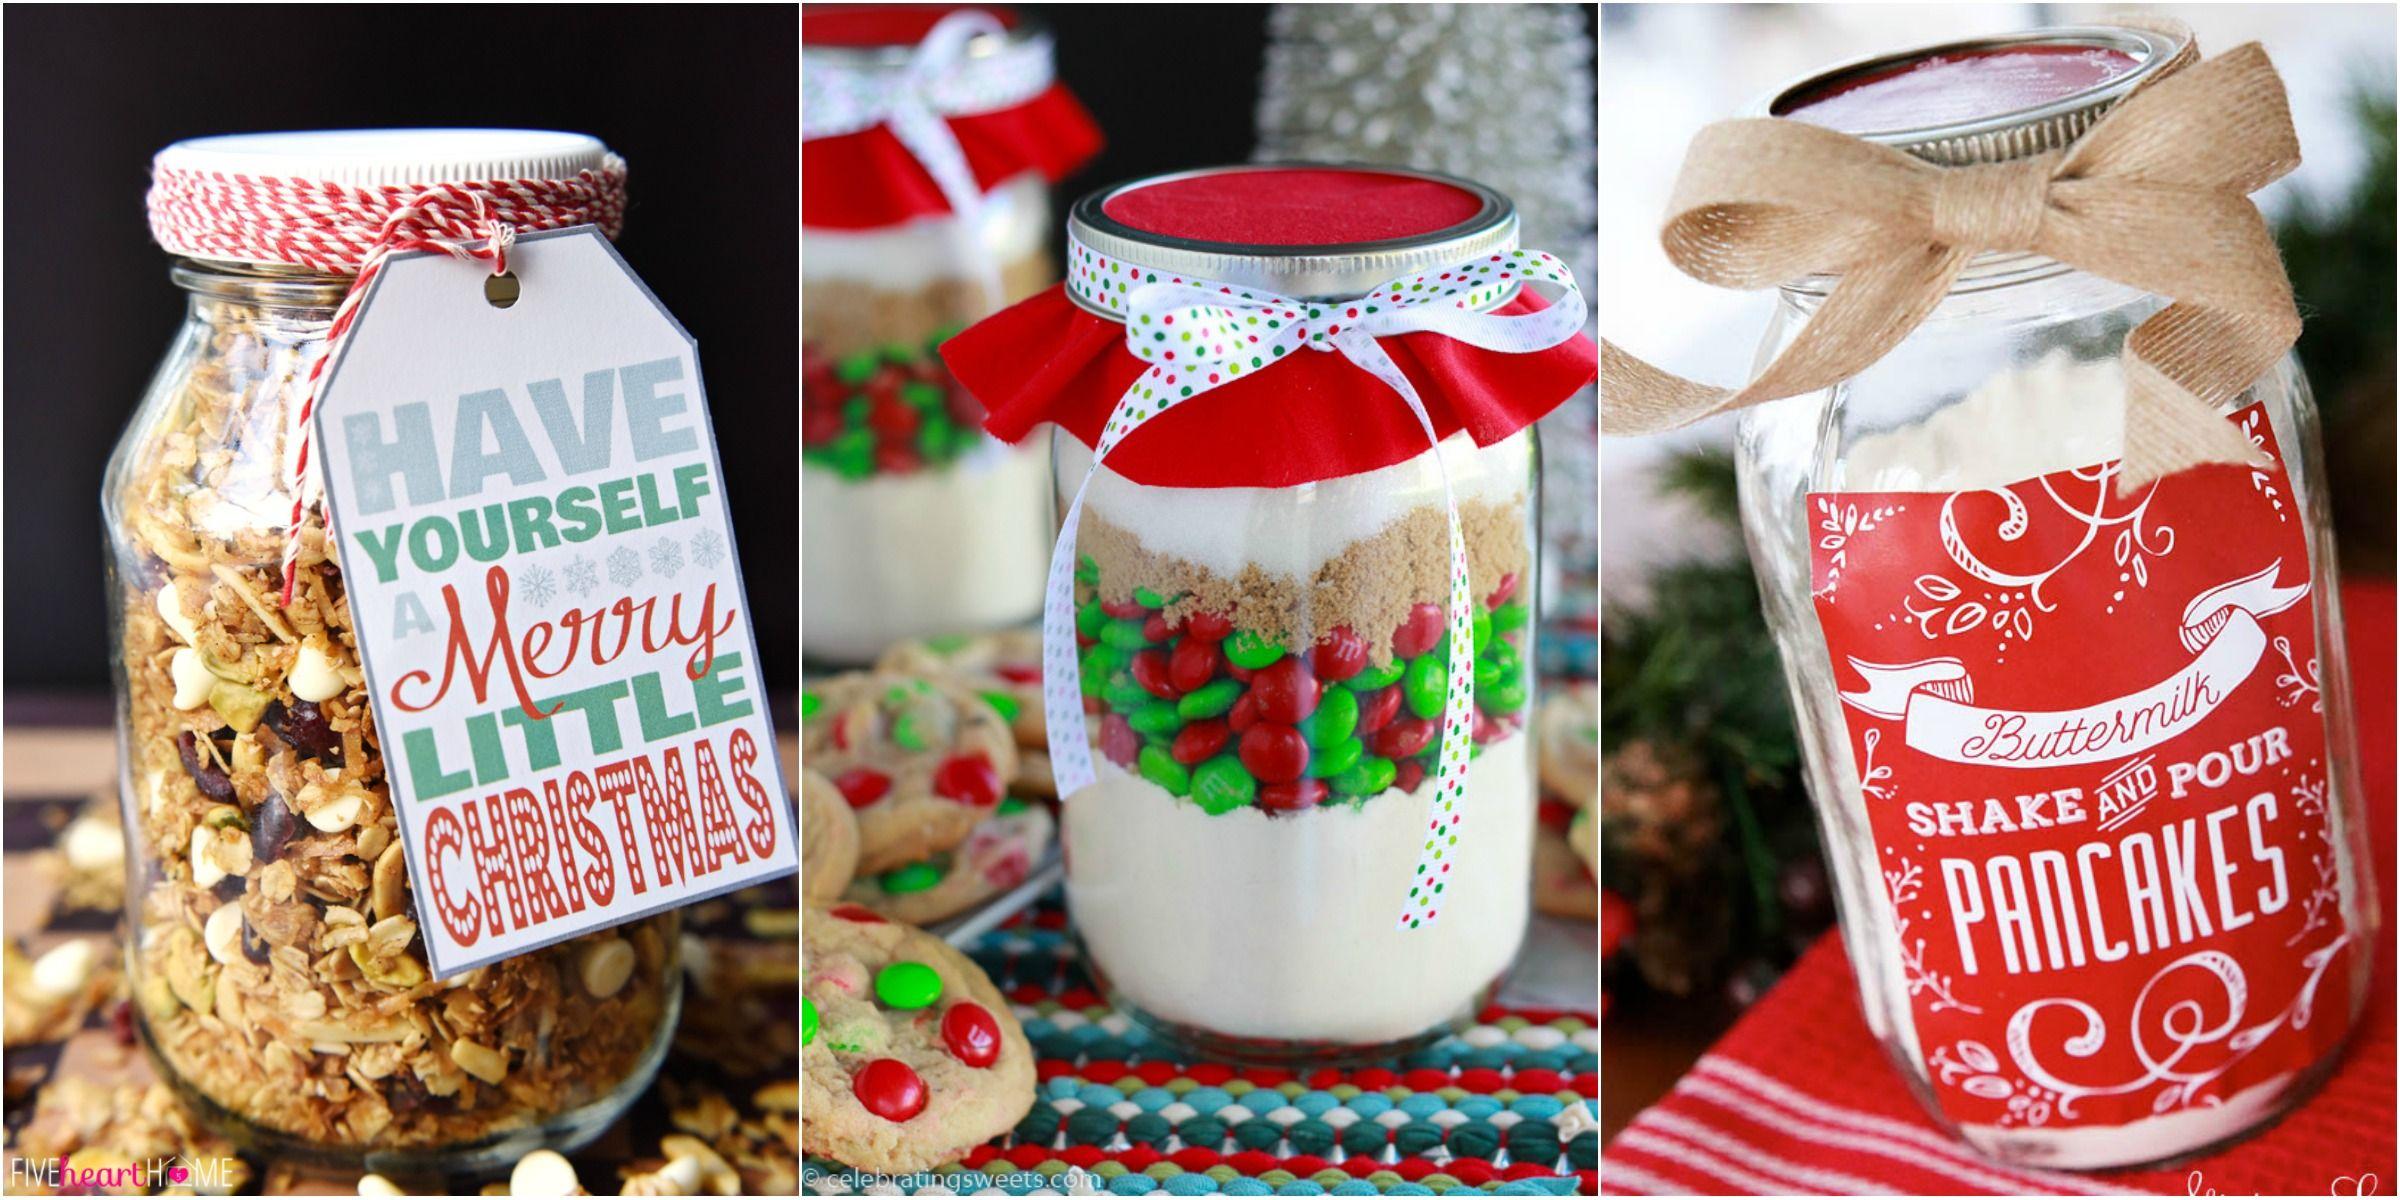 34 Mason Jar Christmas Food Gifts – Recipes for Gifts in a Mason Jar ...